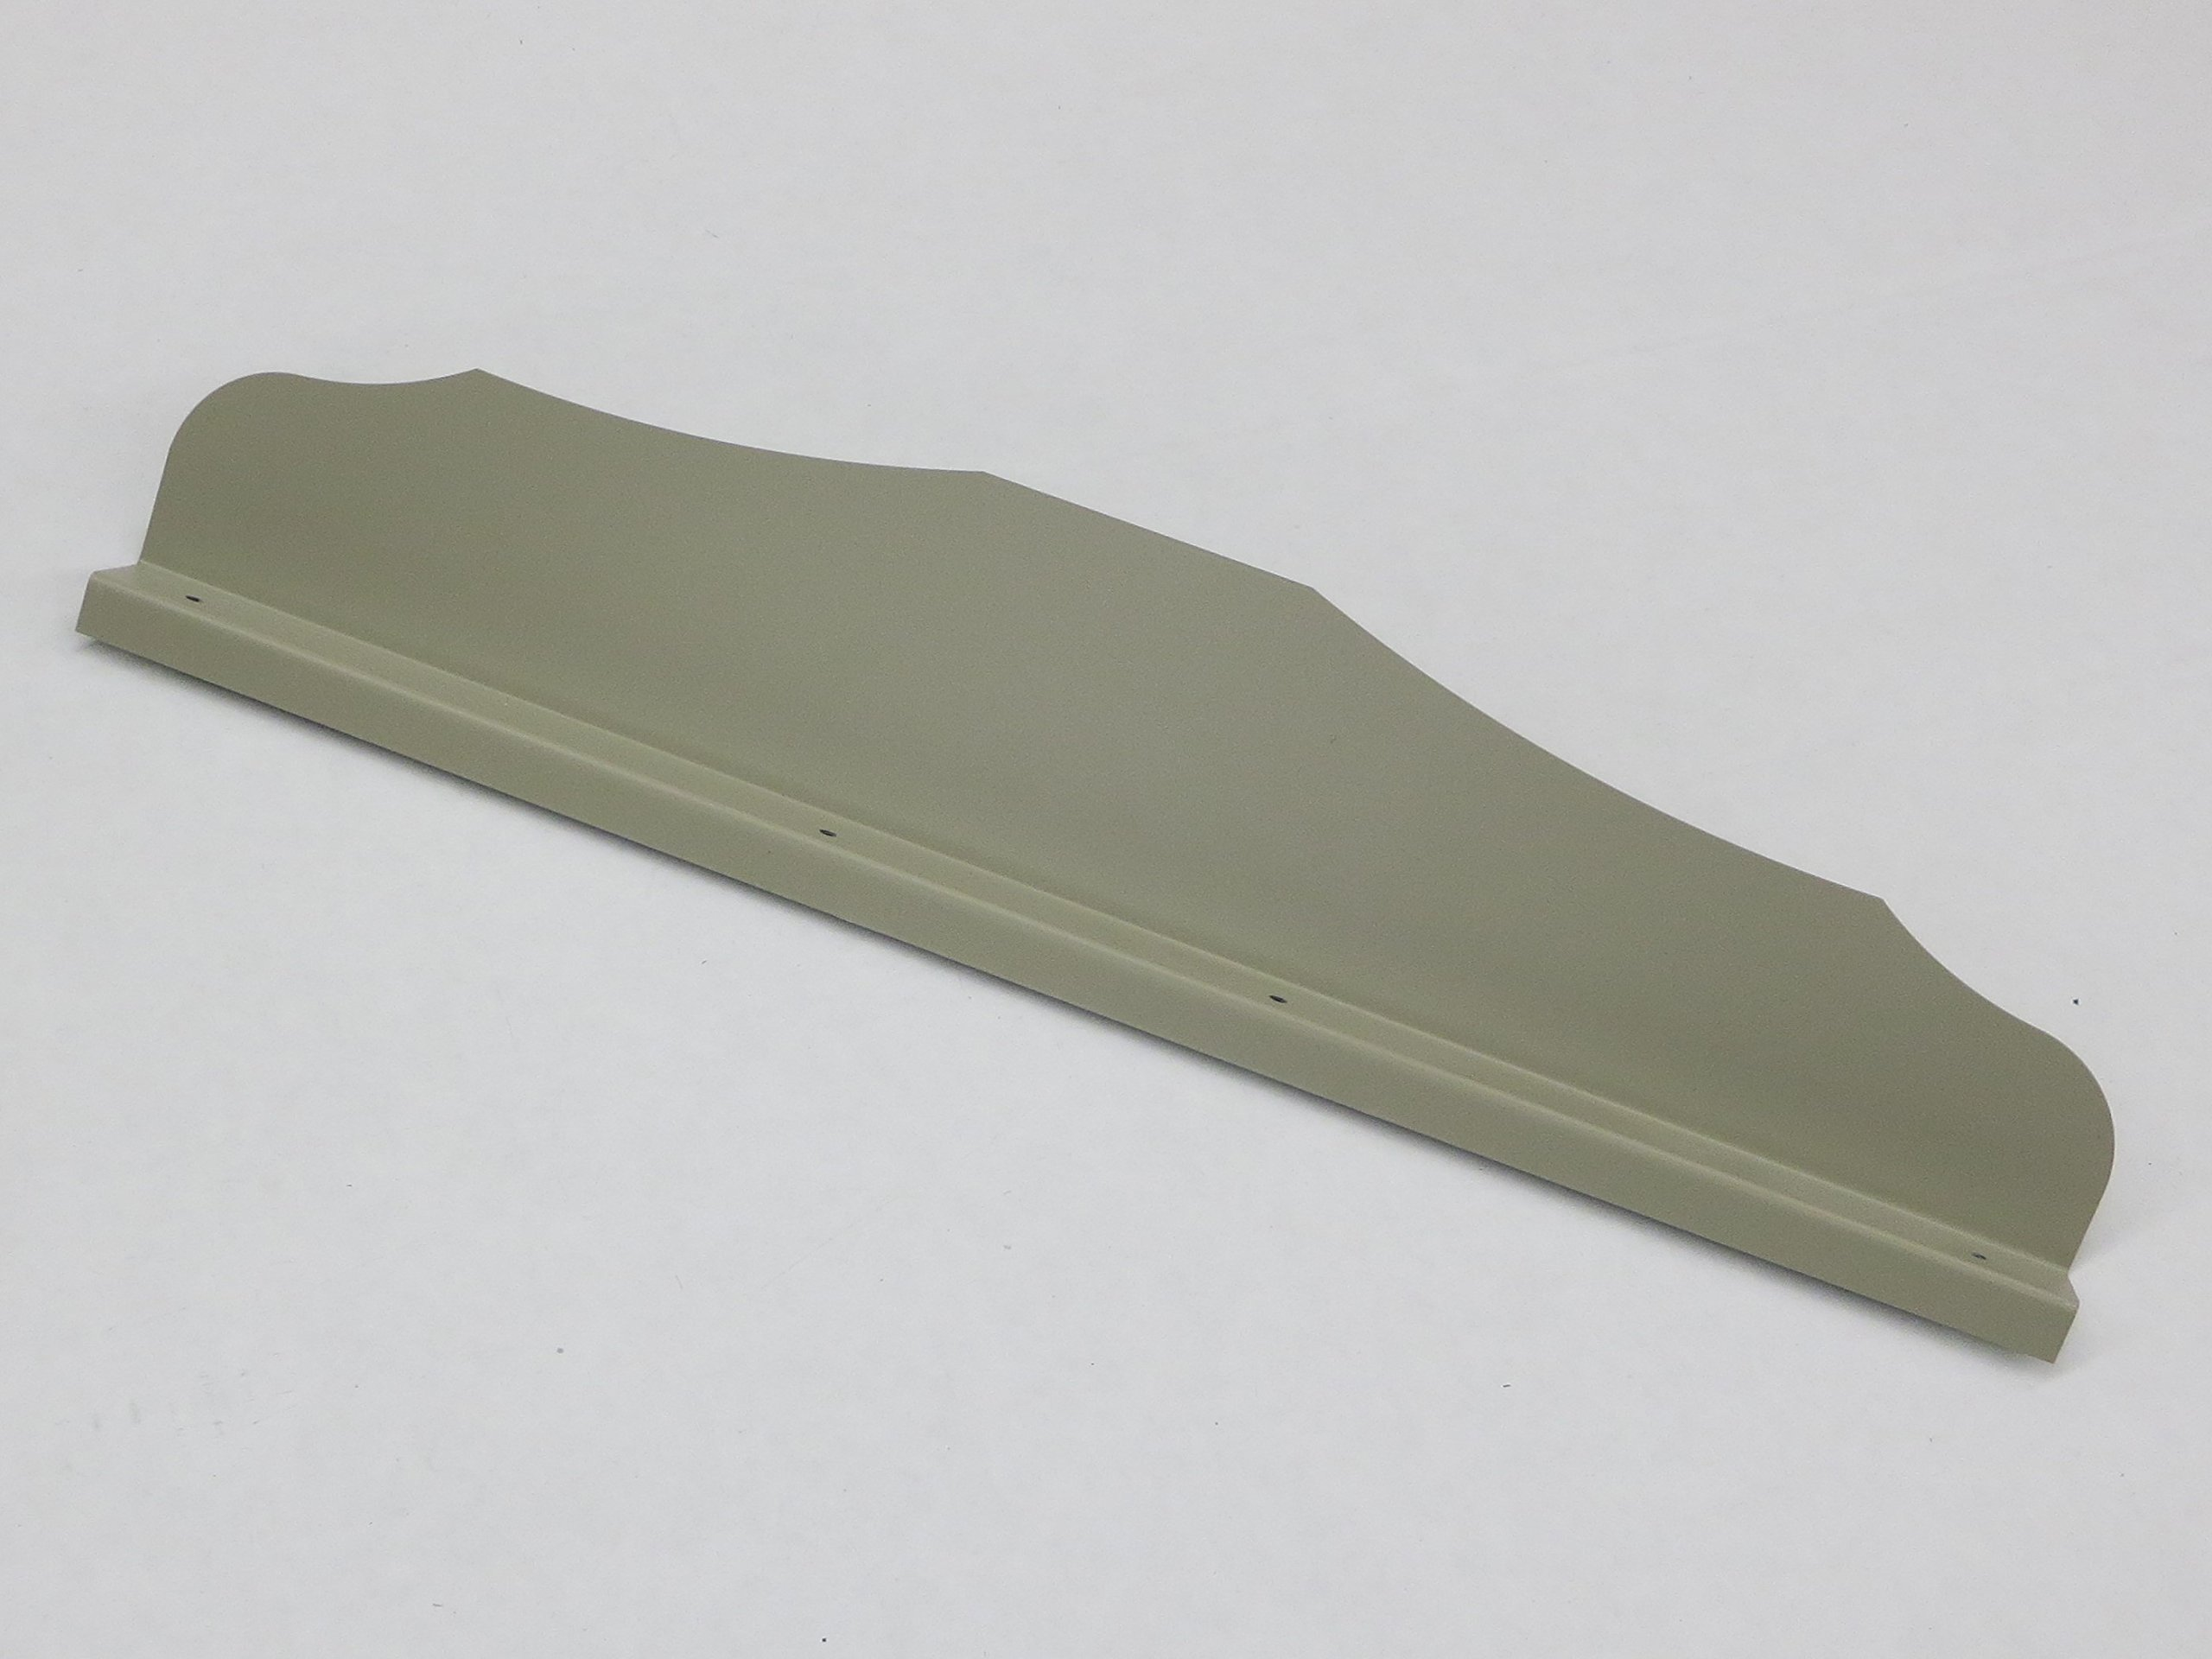 Gutter Valley Splash Guard - Straight Ornamental (BRONZE (12 CT))